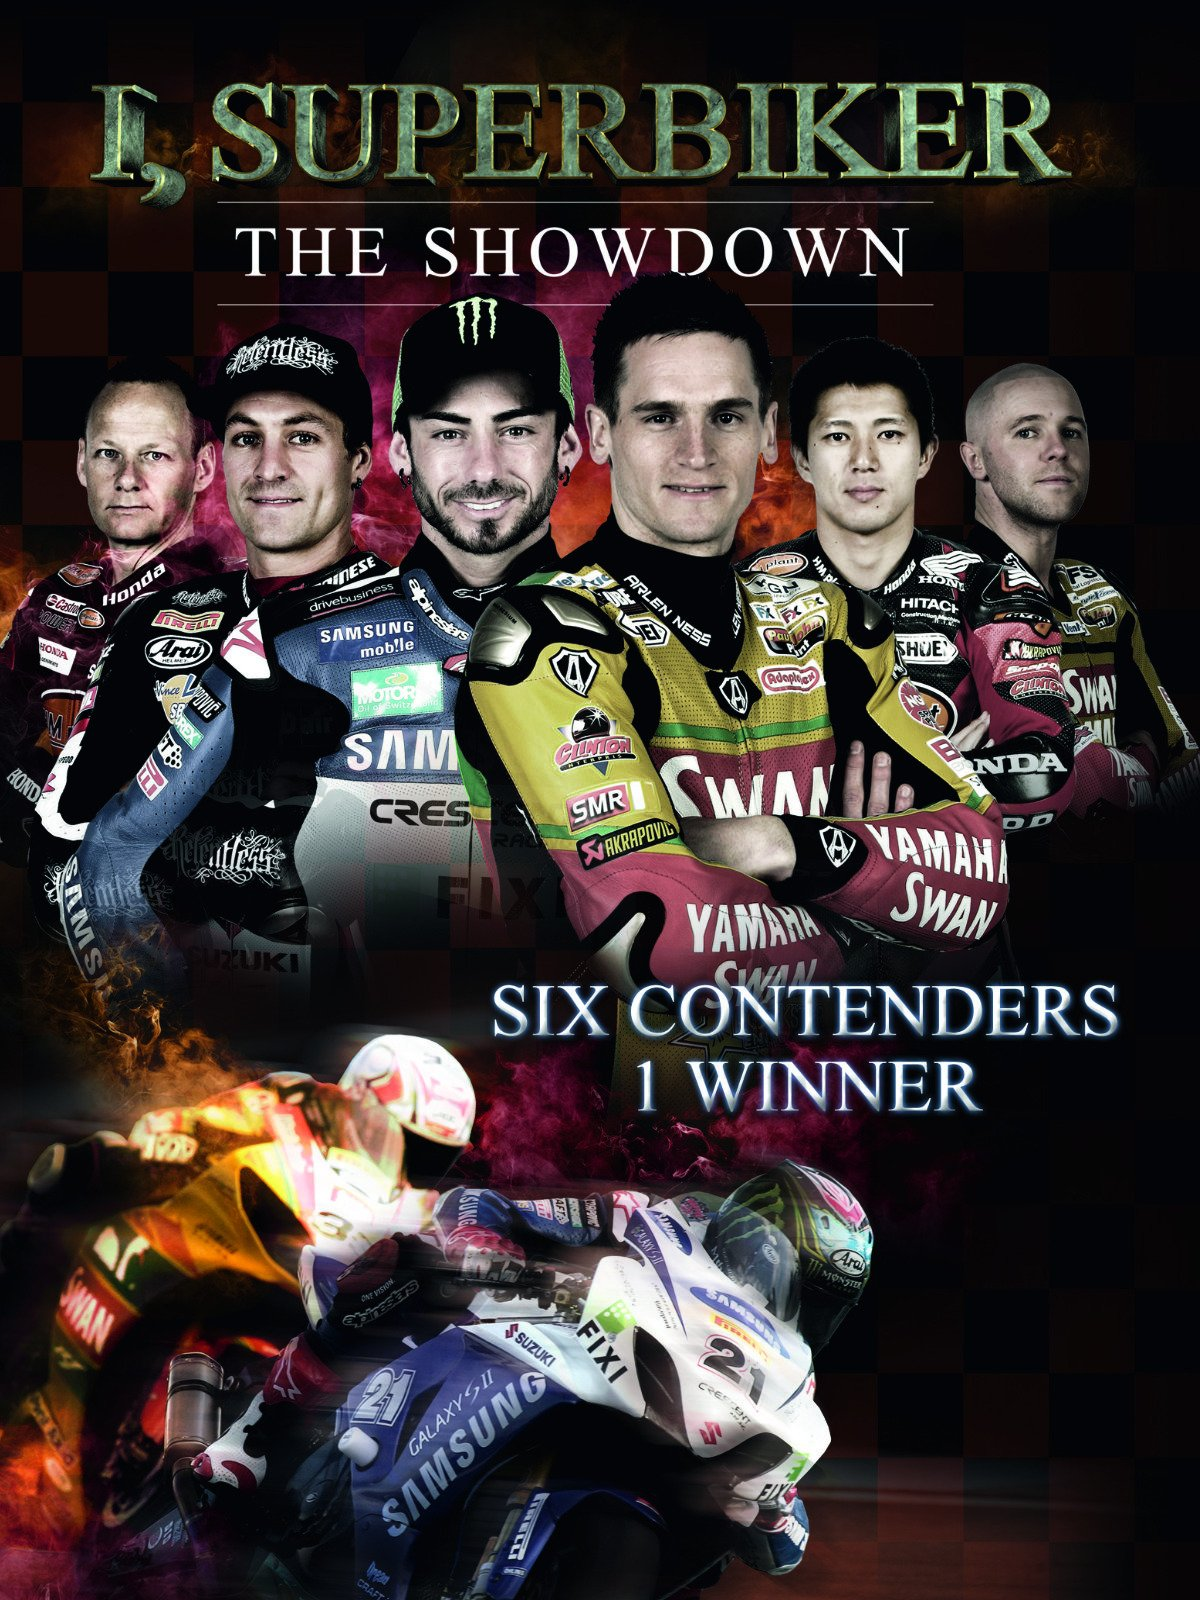 I Superbiker 2 - The Showdown on Amazon Prime Video UK